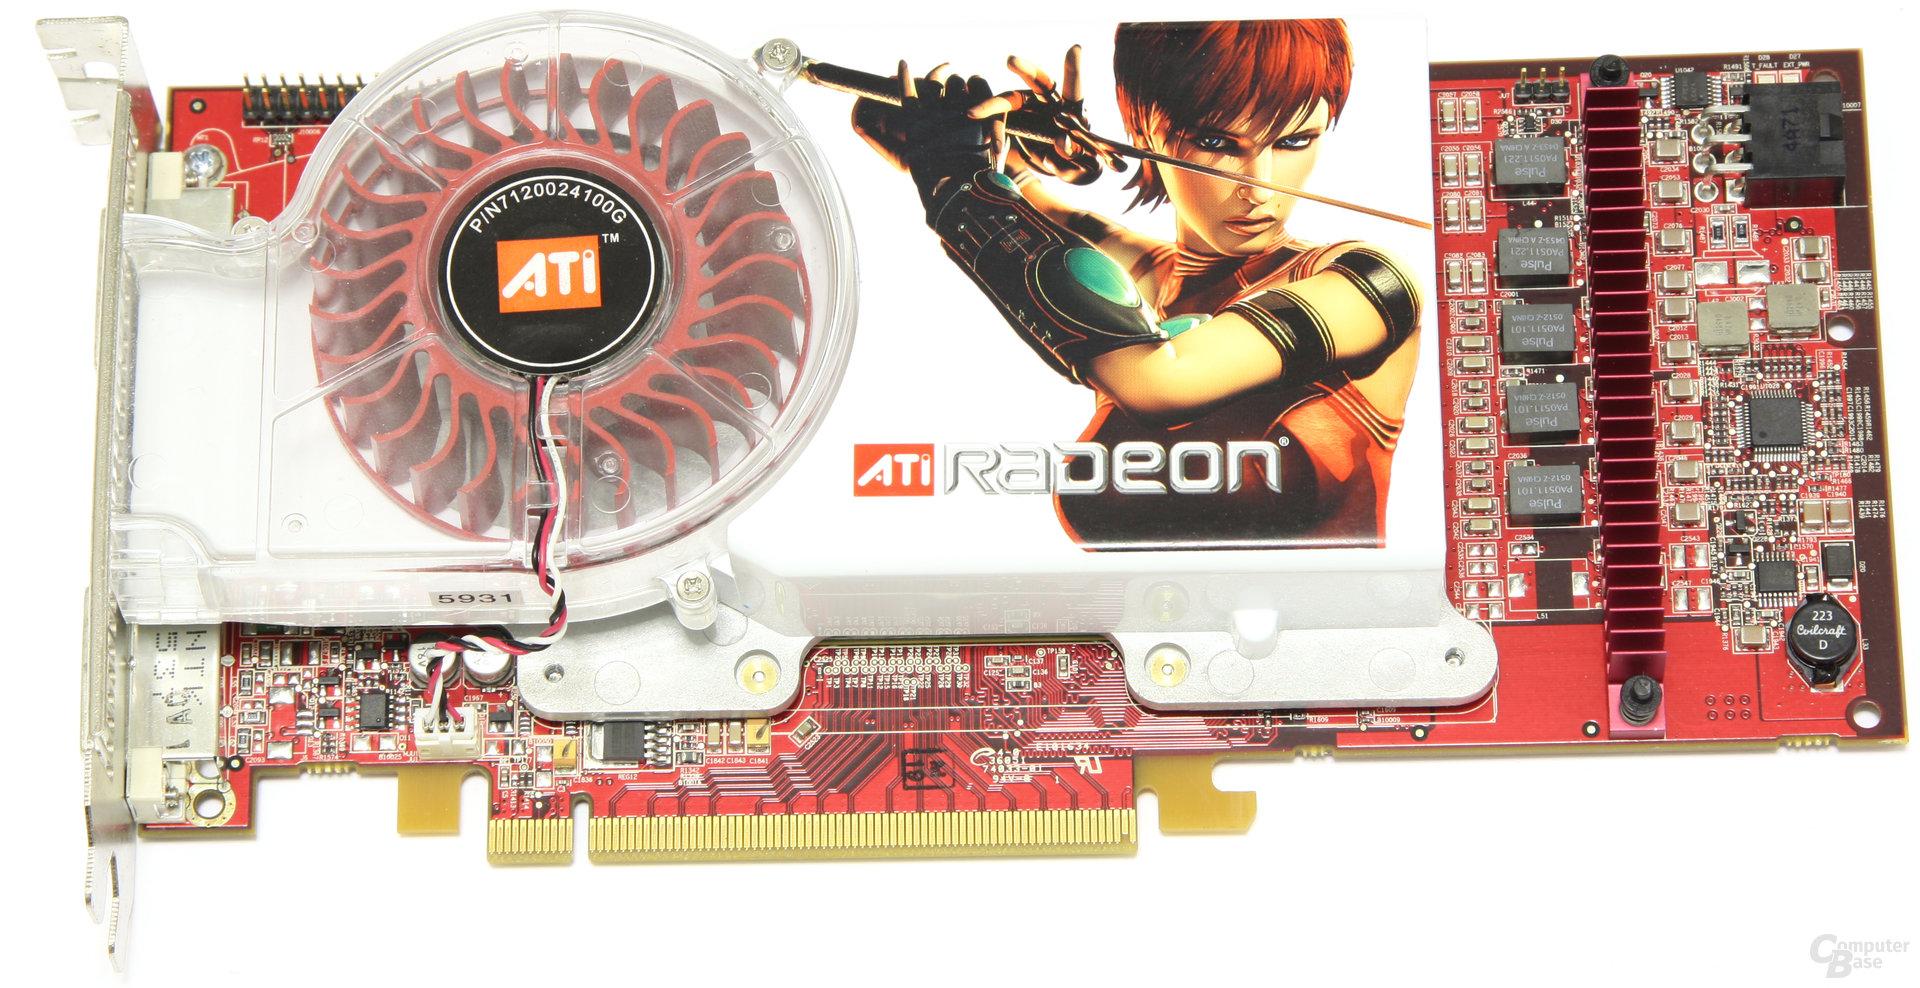 ATi Radeon X1800 XT (2005)